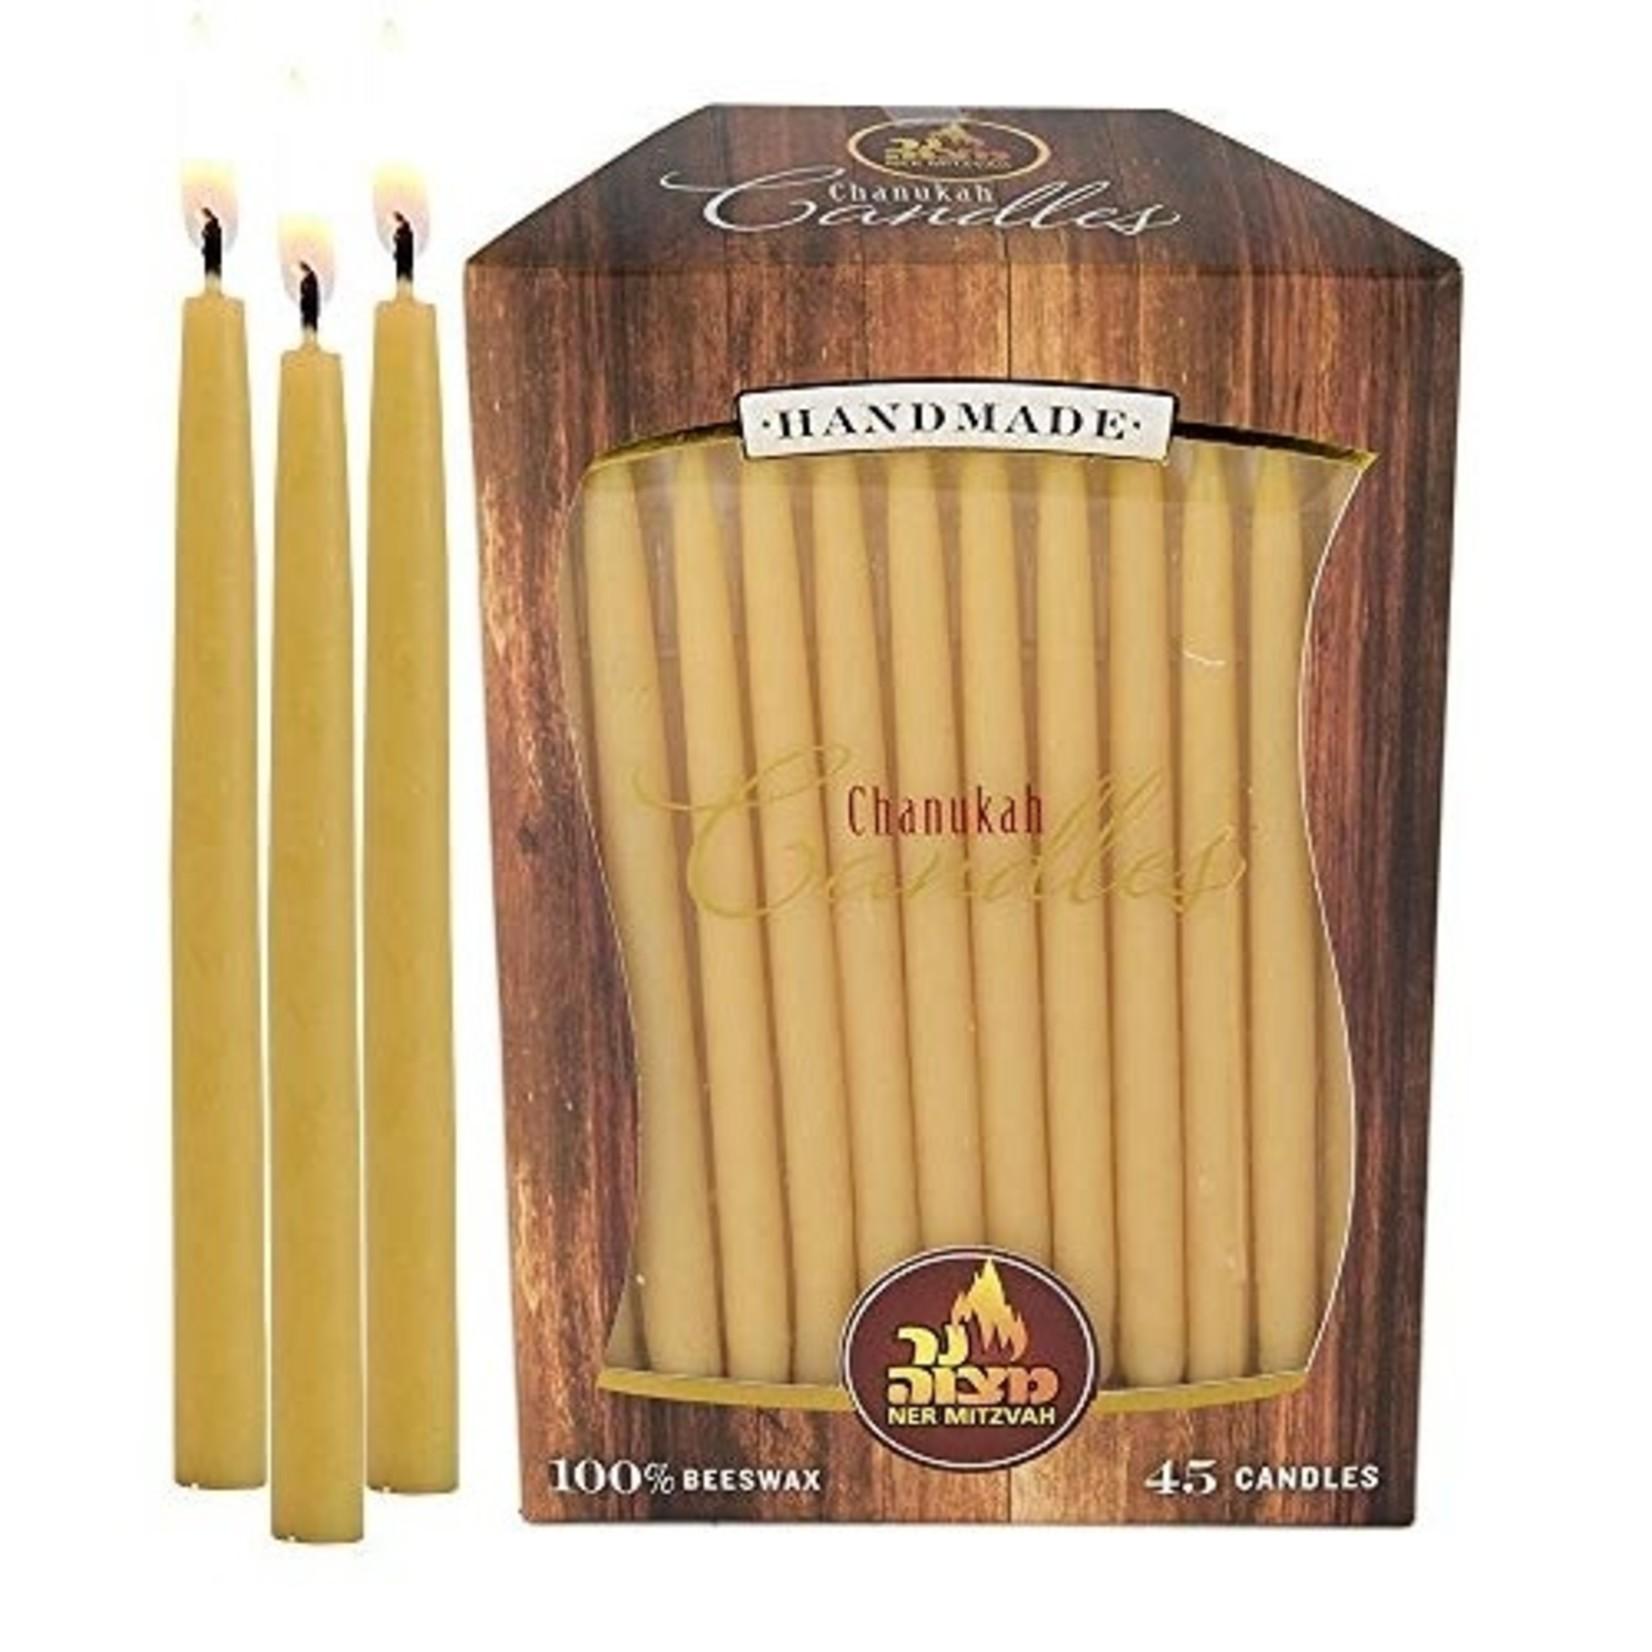 Ner Mitzvah Ner Mitzvah Yellow Handmade Natural Beeswax Hannukah Candles